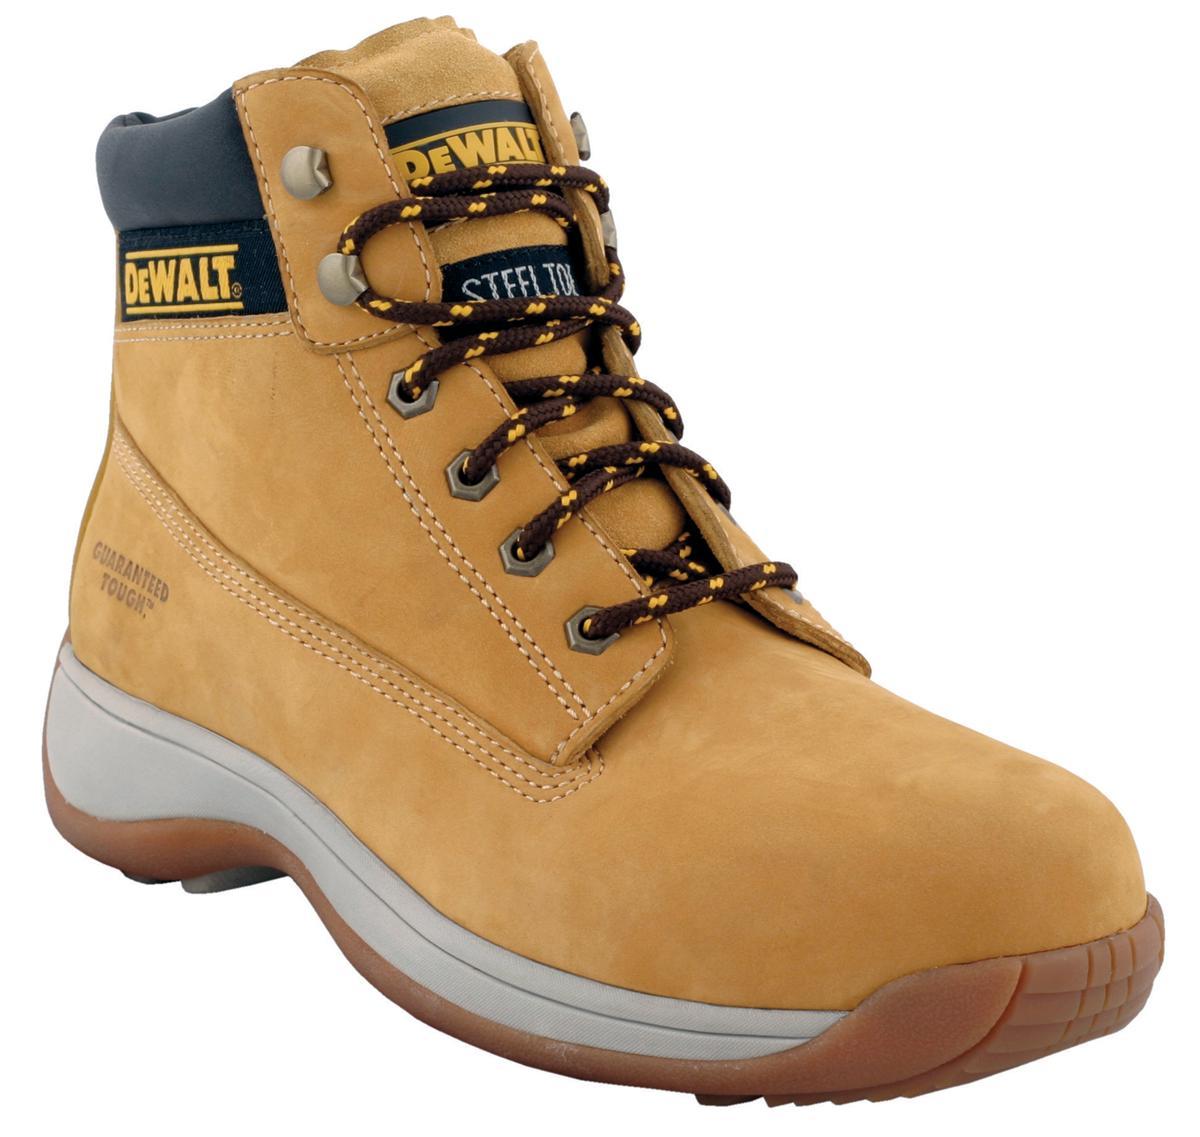 Dewalt Hiker Boots Nubuck Shock-absorbent Chemical-resistant Size 12 Wheat Ref Apprentice 12